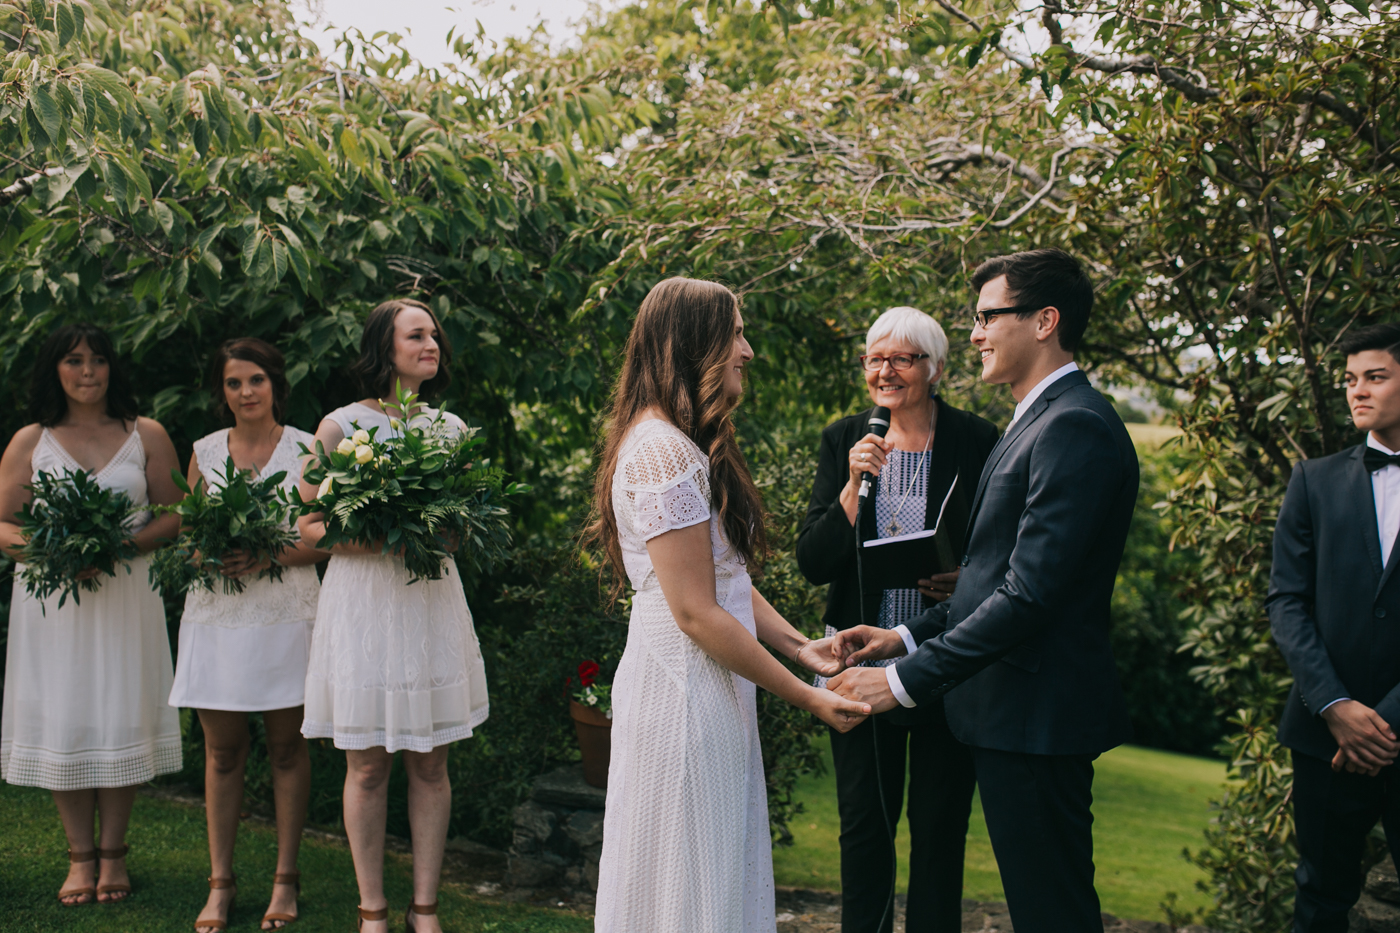 Ariana & Tim - Dunedin, New Zealand Wedding - Destination Wedding - Samantha Heather Photography-84.jpg